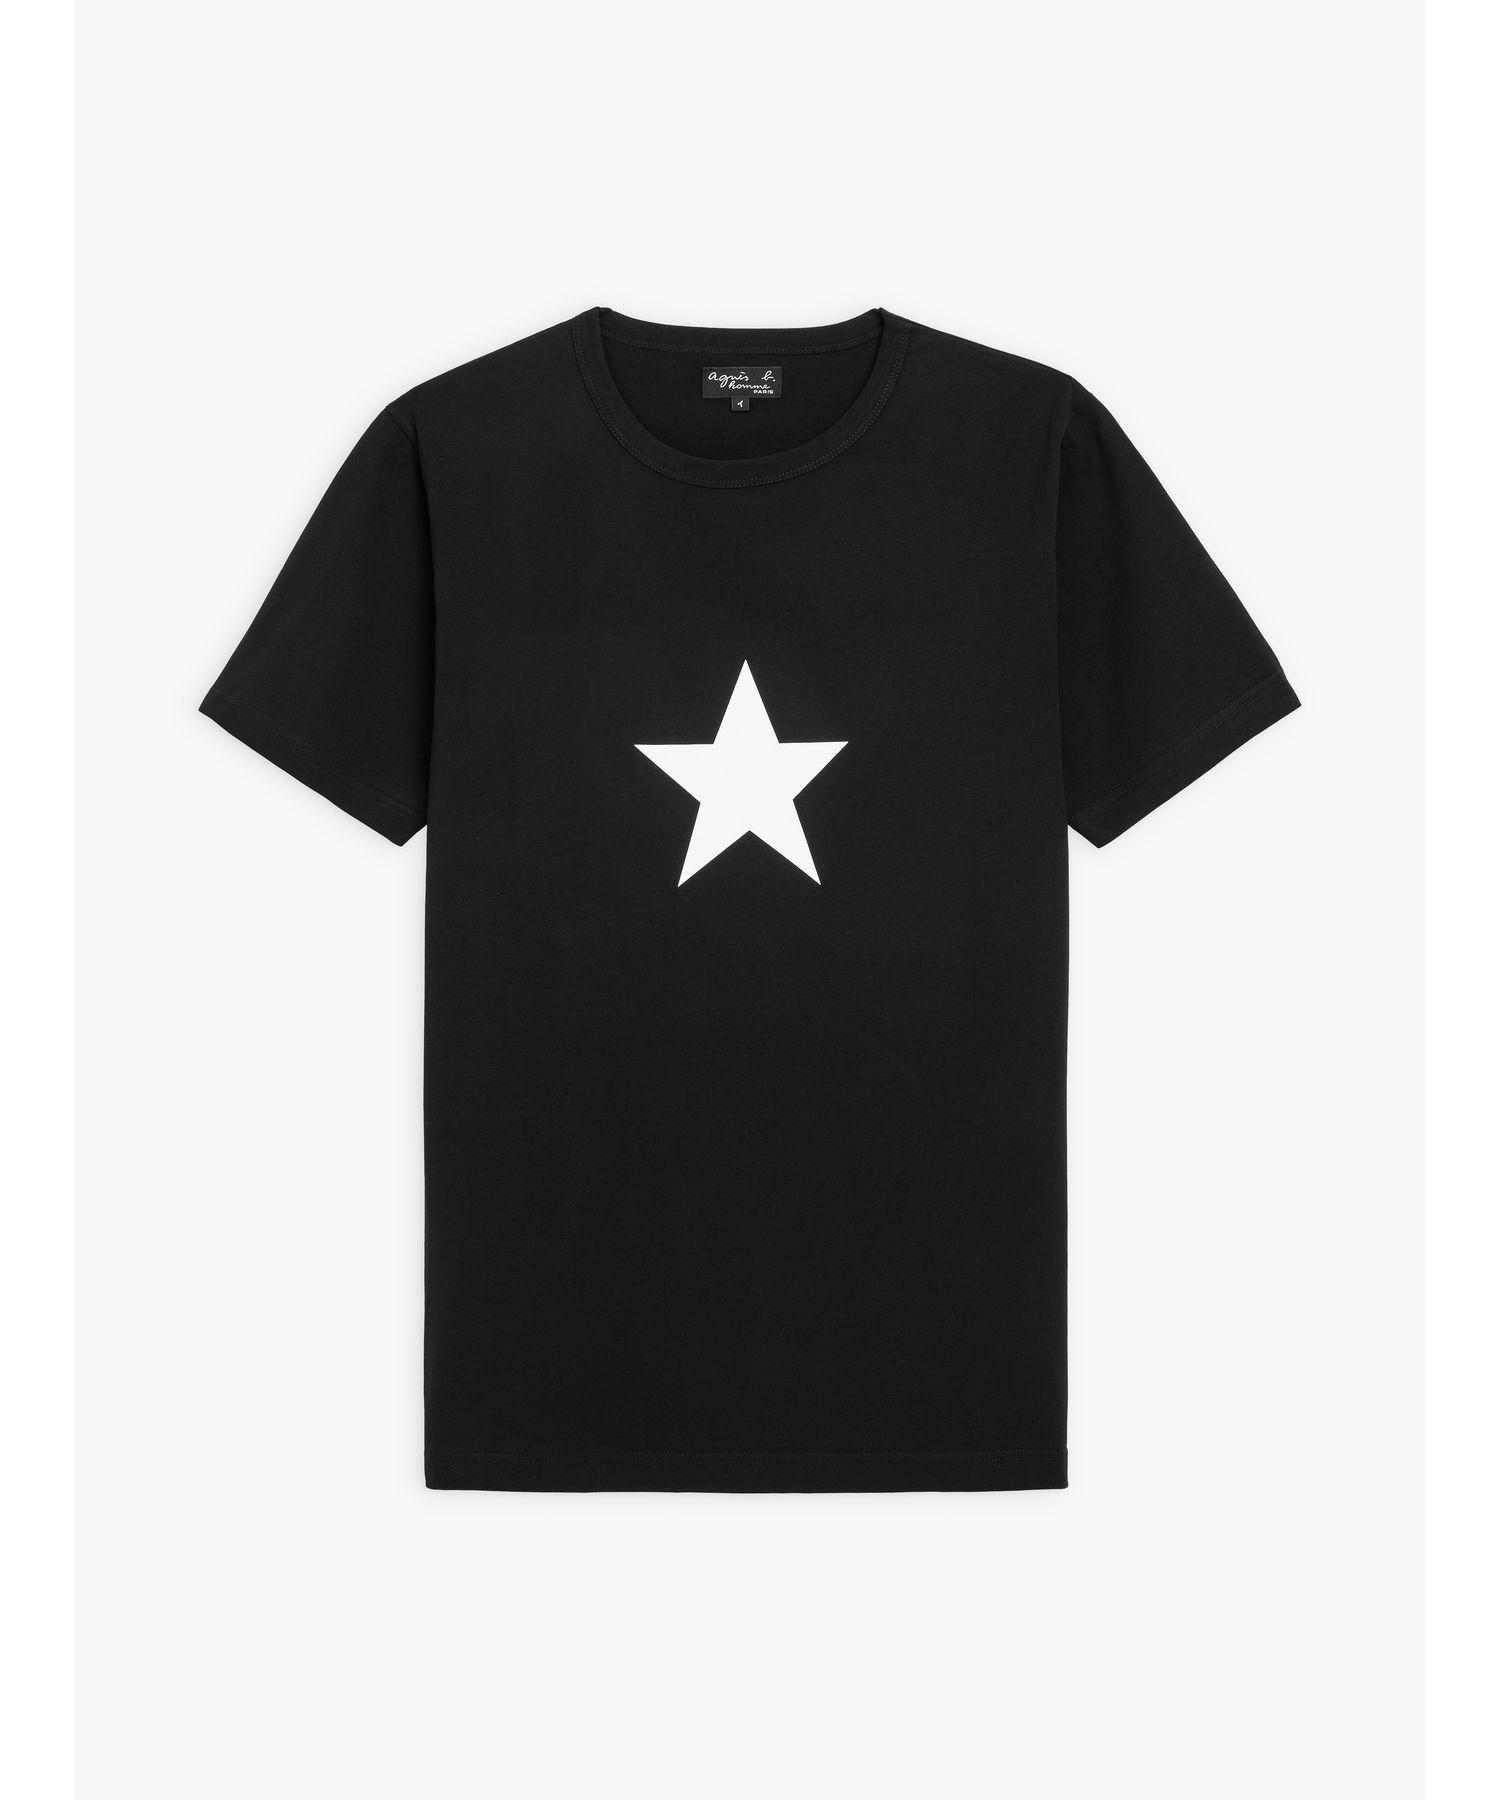 SD02 TS エトワールTシャツ